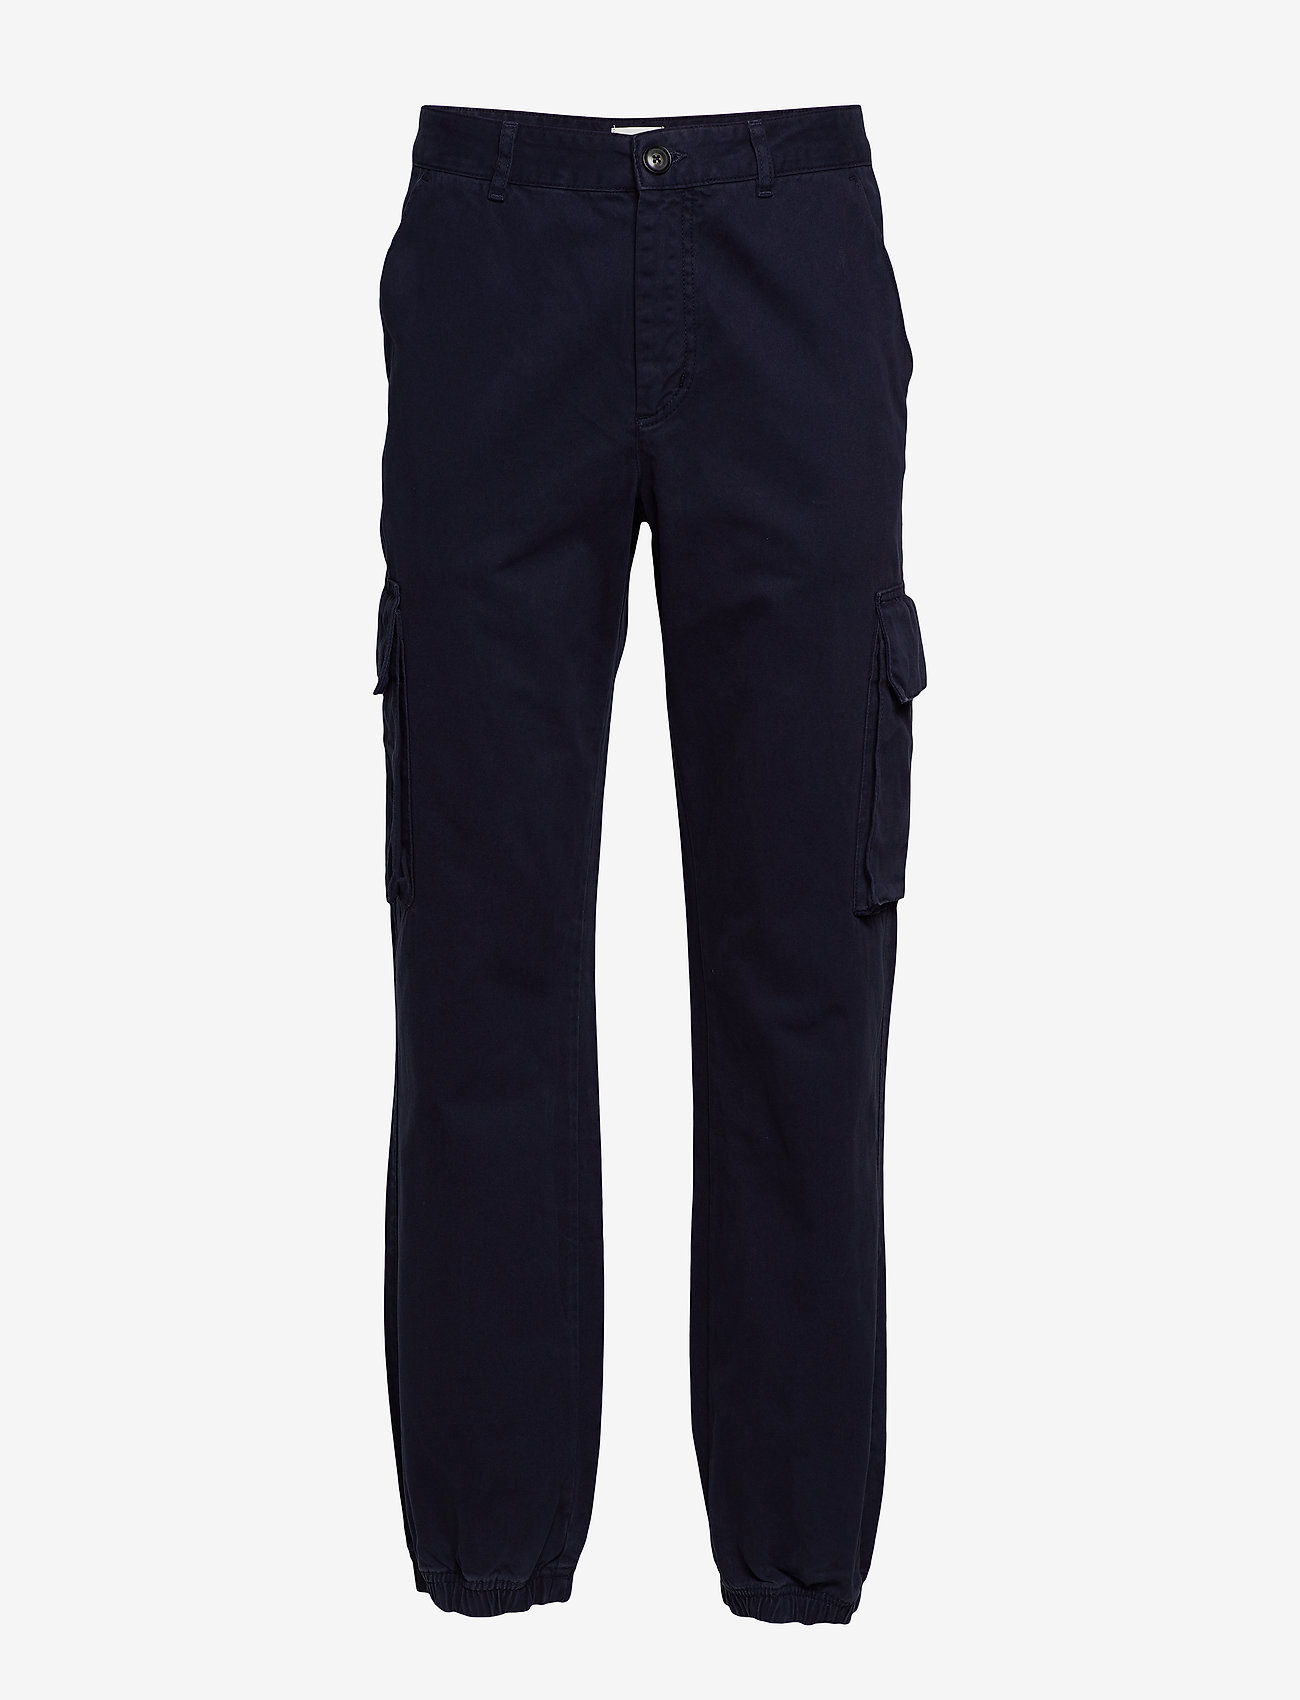 Wood Wood - Eigil trousers - bojówki - navy - 0